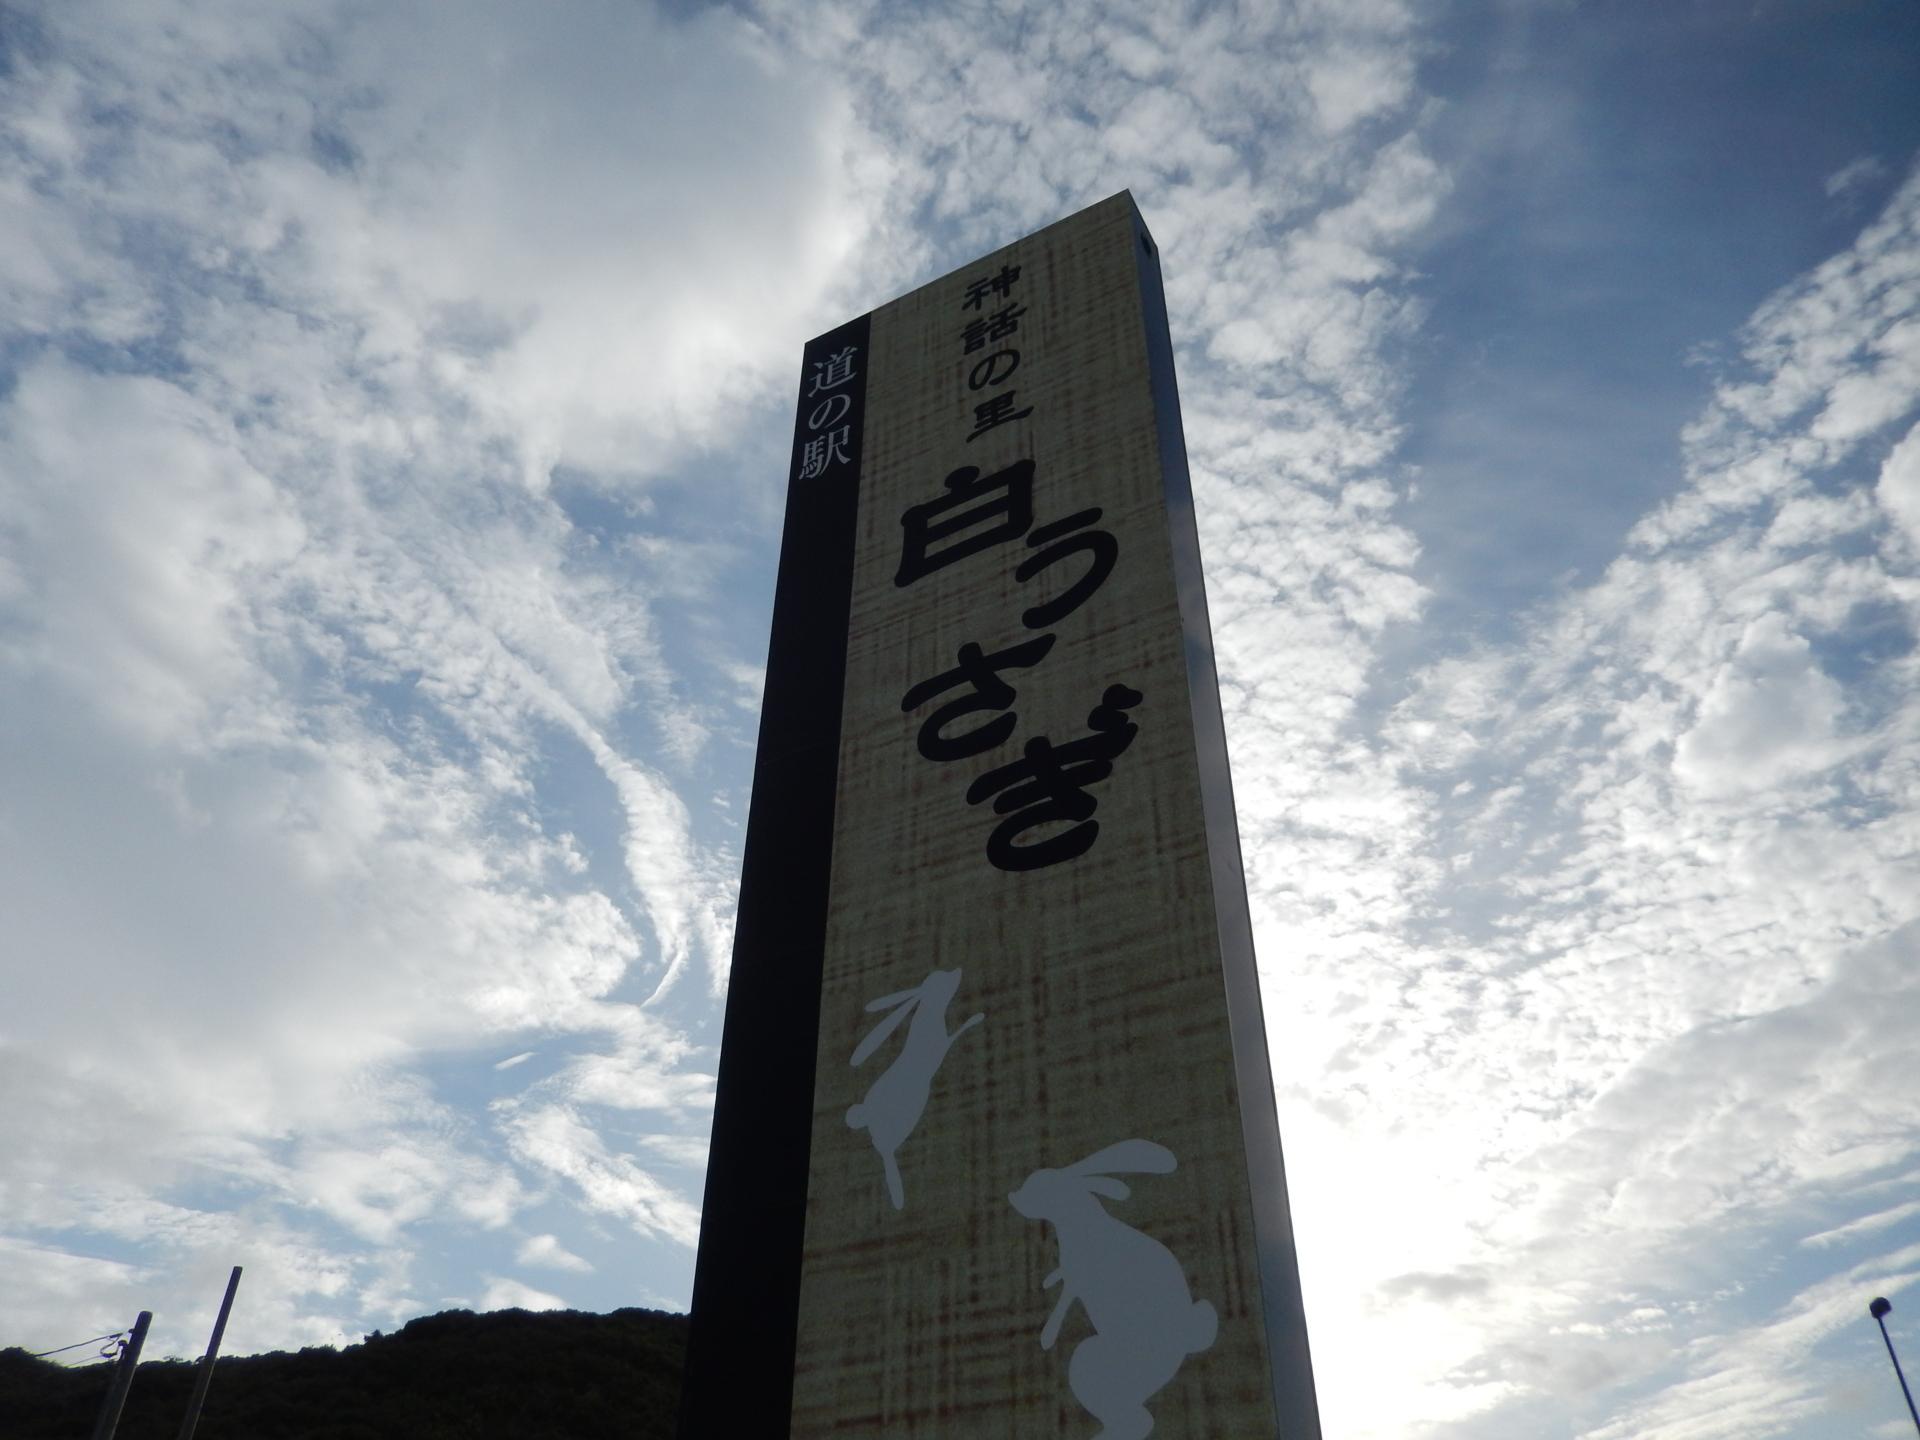 f:id:ToshUeno:20140926162415j:plain